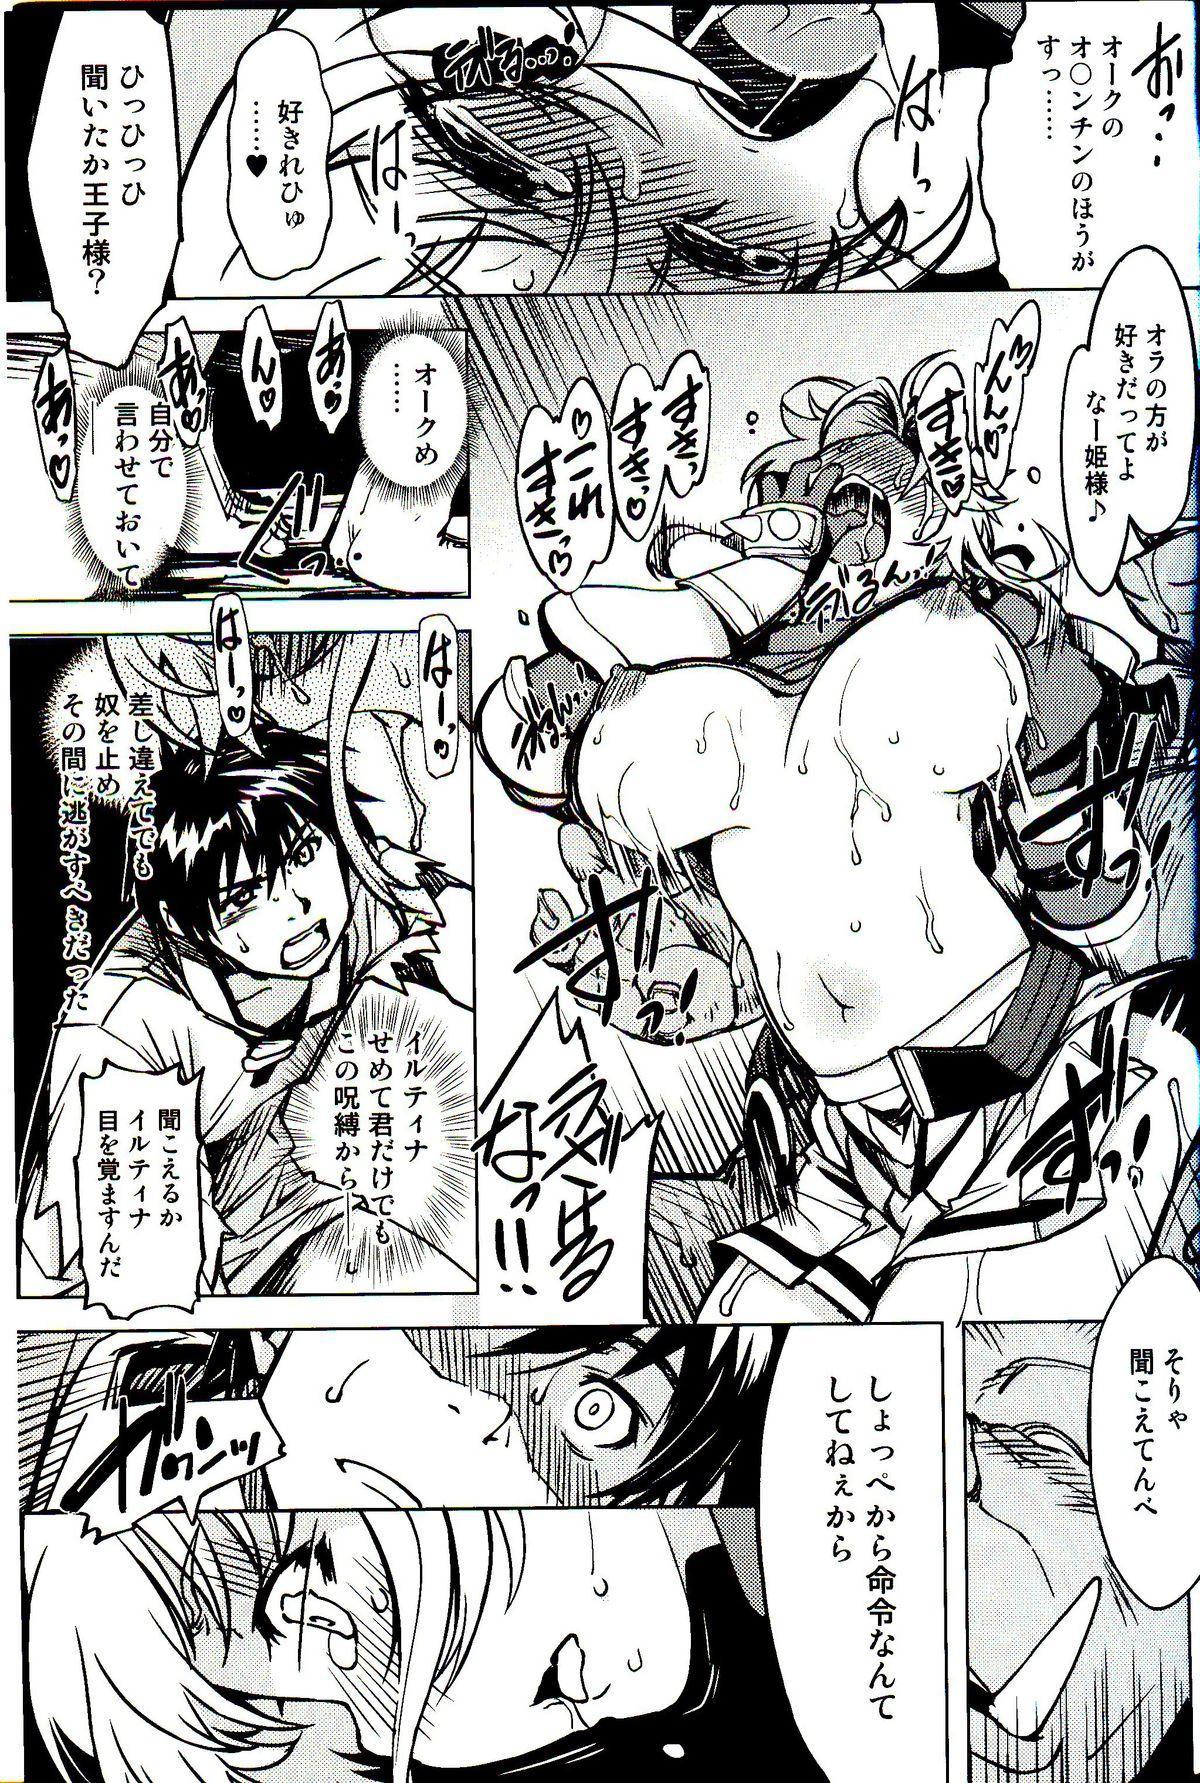 Hime Kishi Tame 3 20